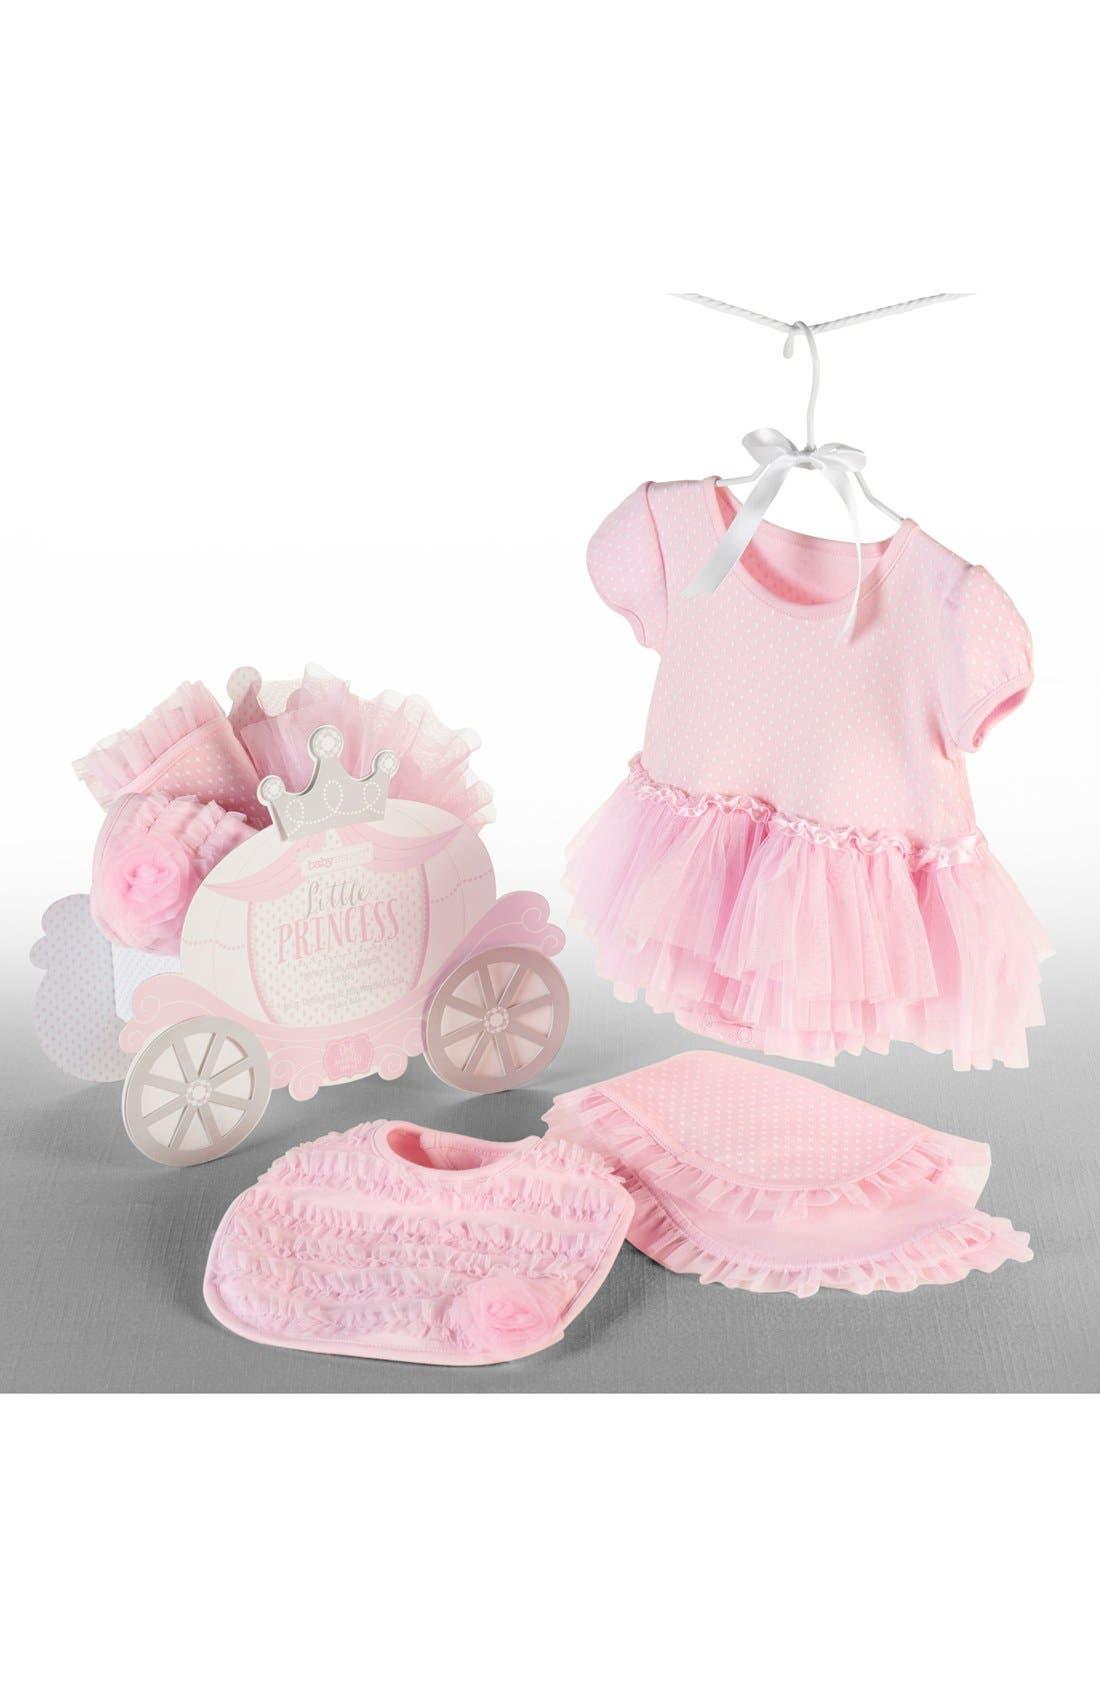 BABY ASPEN, Little Princess 3-Piece Gift Set, Main thumbnail 1, color, PINK